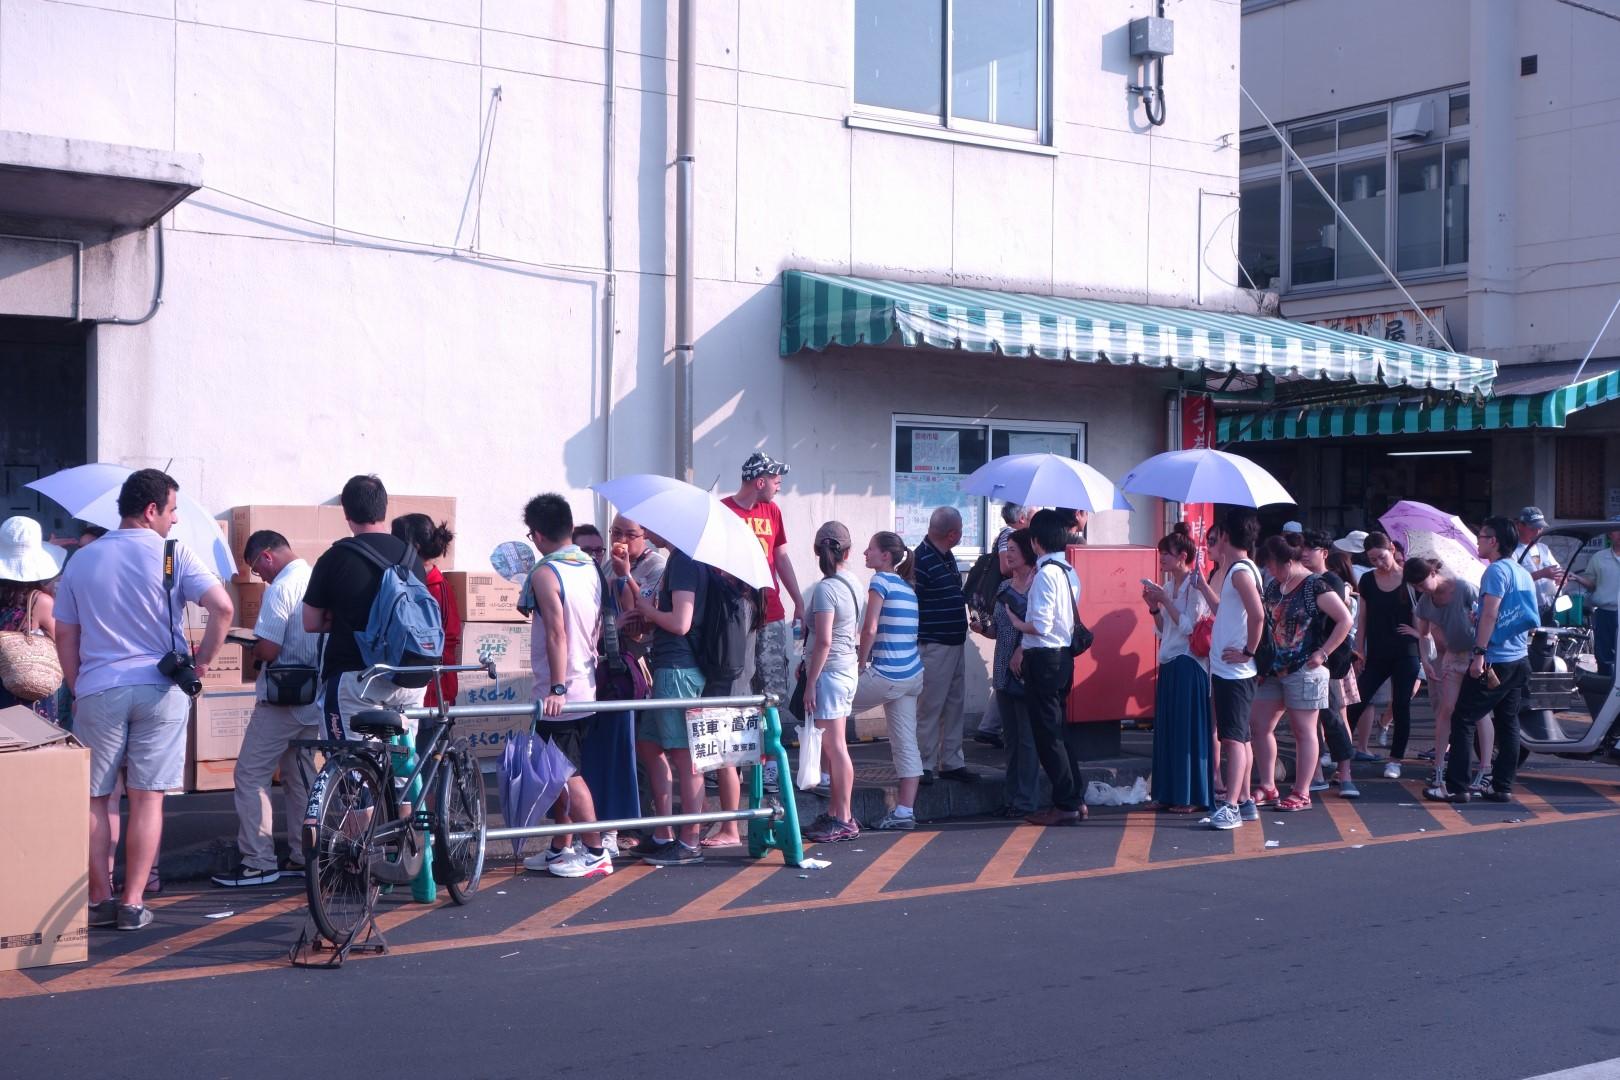 A visit to the world s biggest fish market tsukiji market for Sushi grade fish market